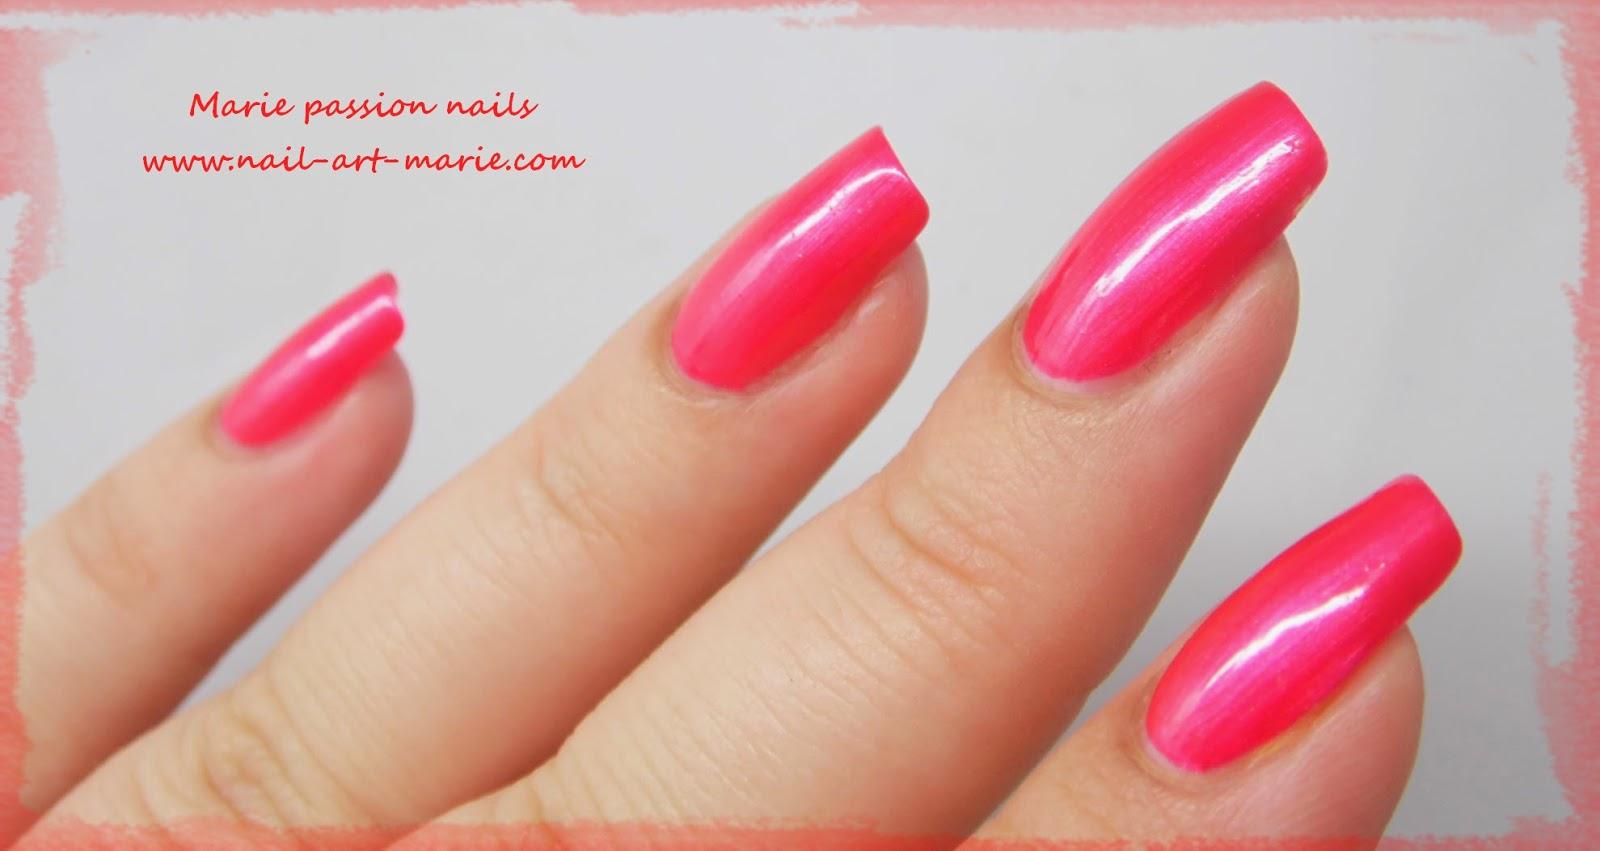 LM Cosmetic Fonte Nova5